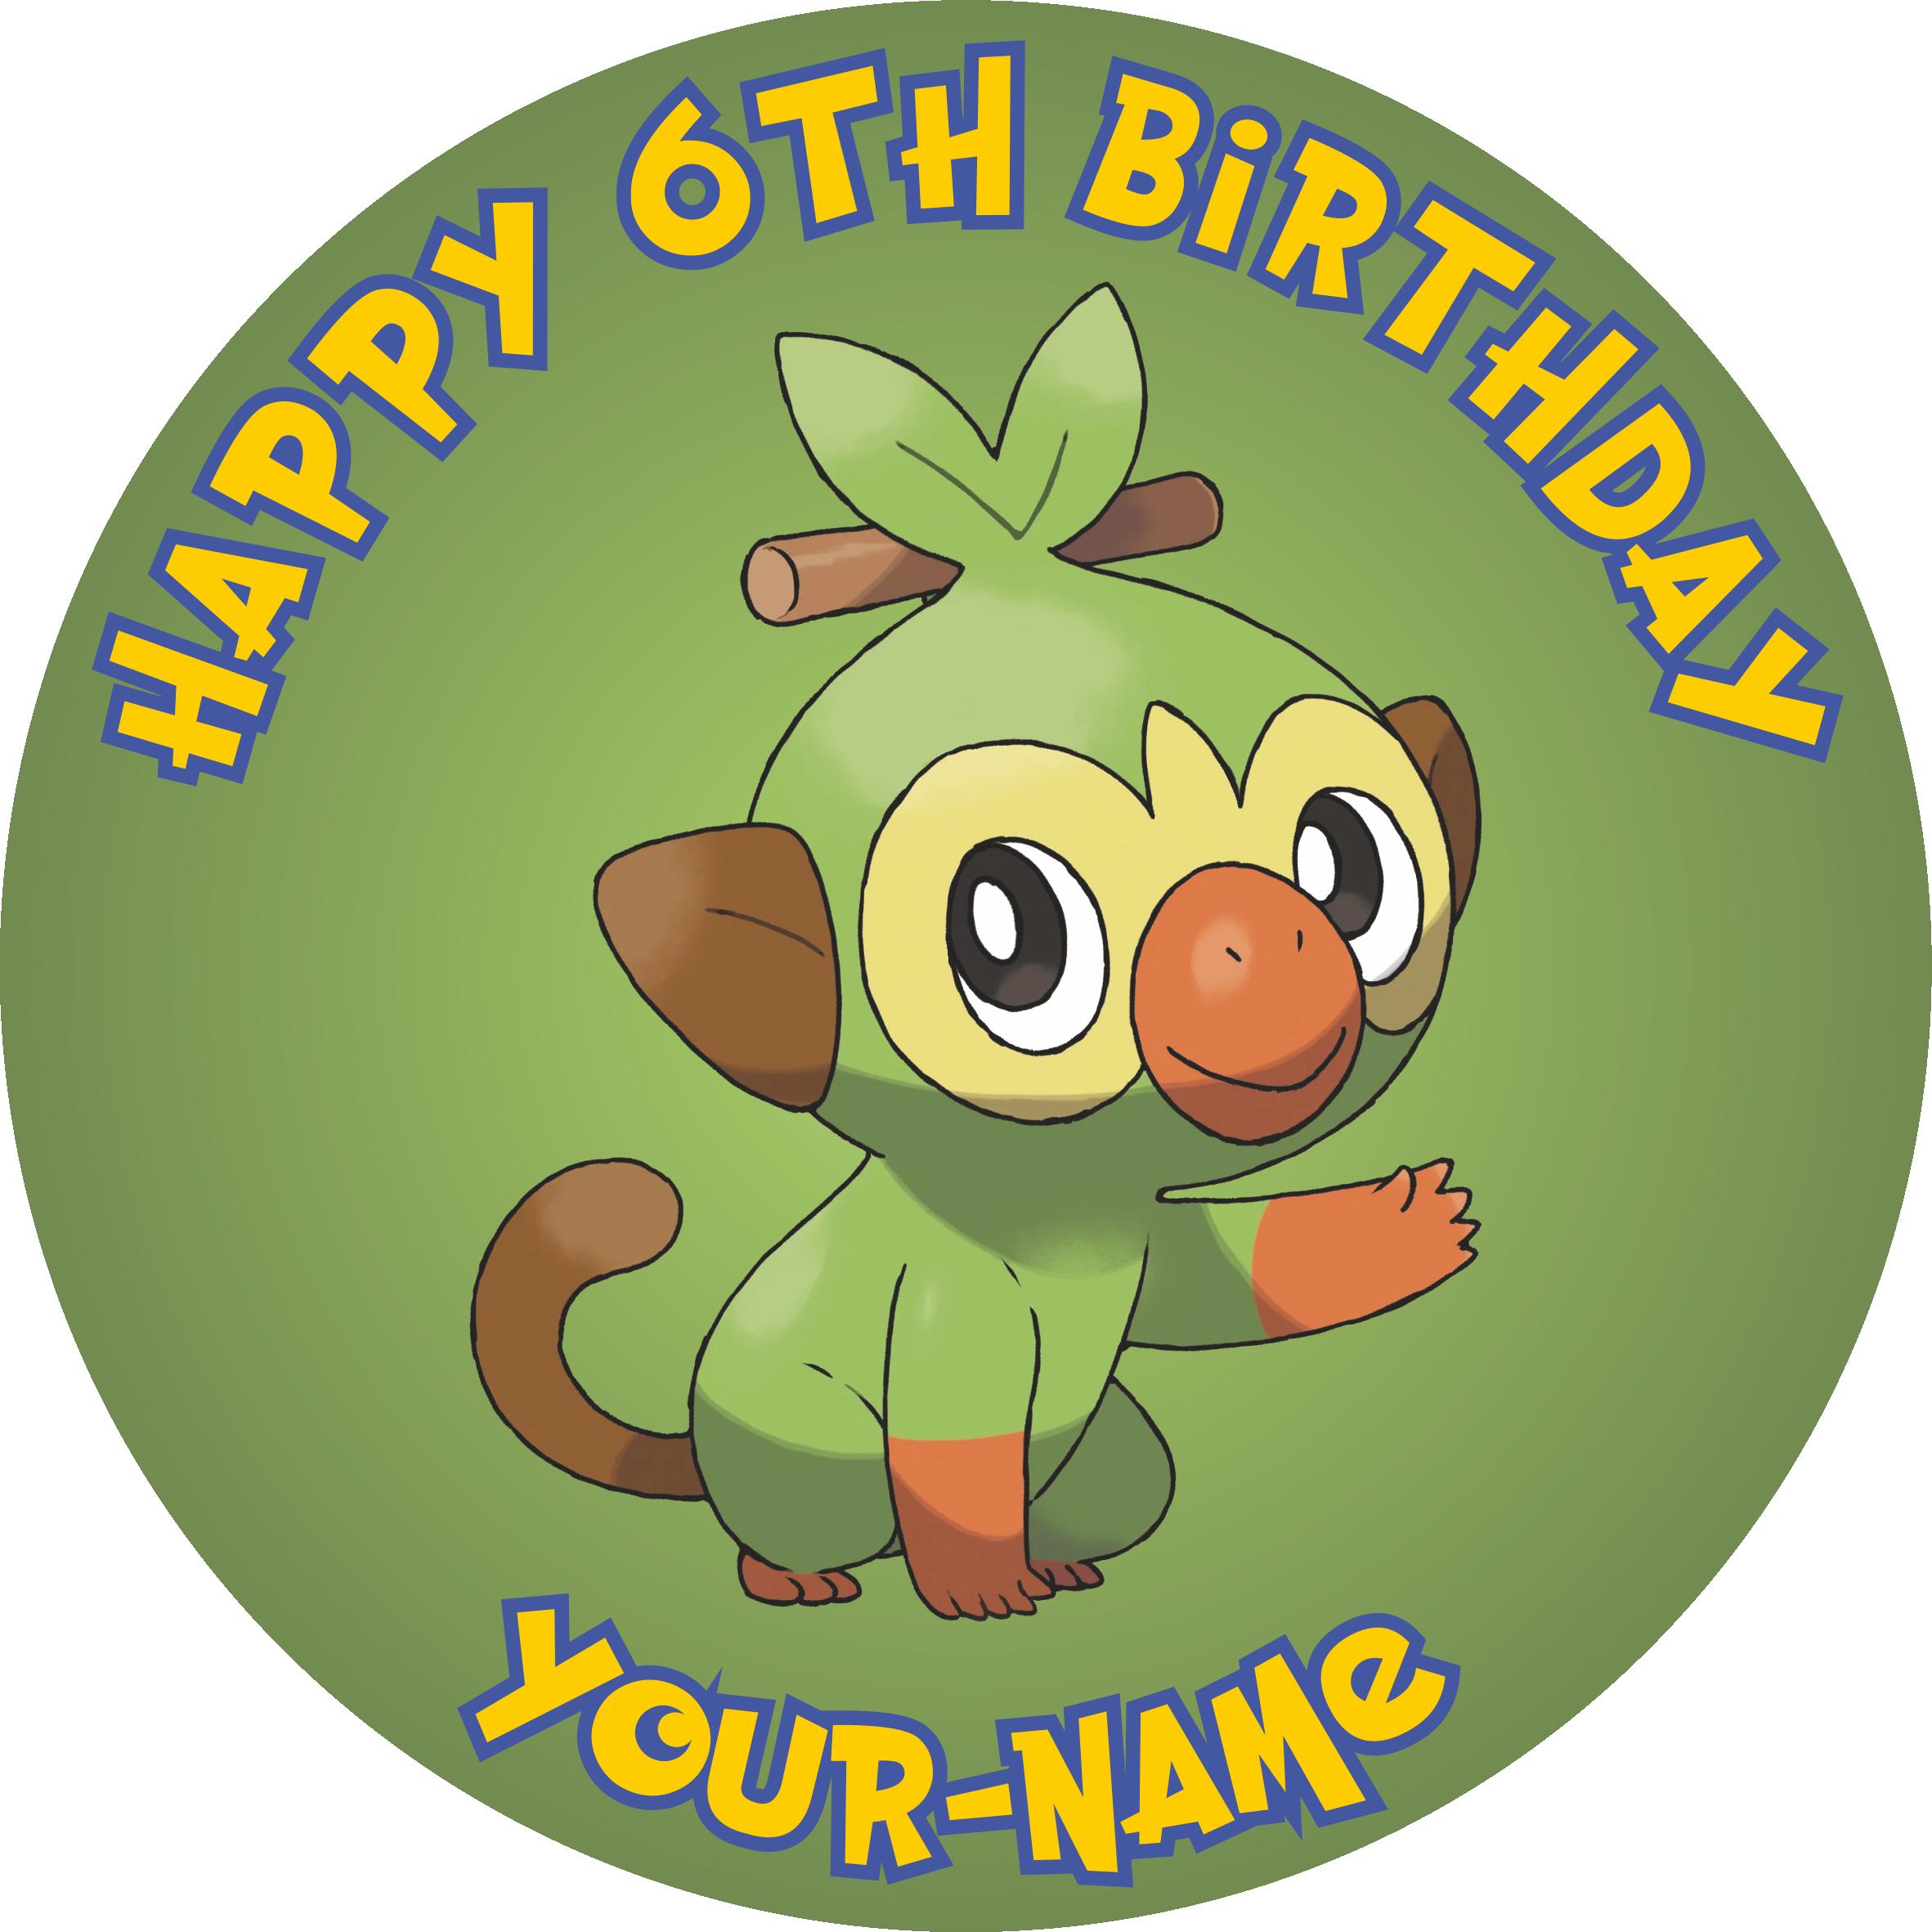 Pokemon Grookey Toptacular My first choice of a name for female grookey is plantainjane. pokemon grookey